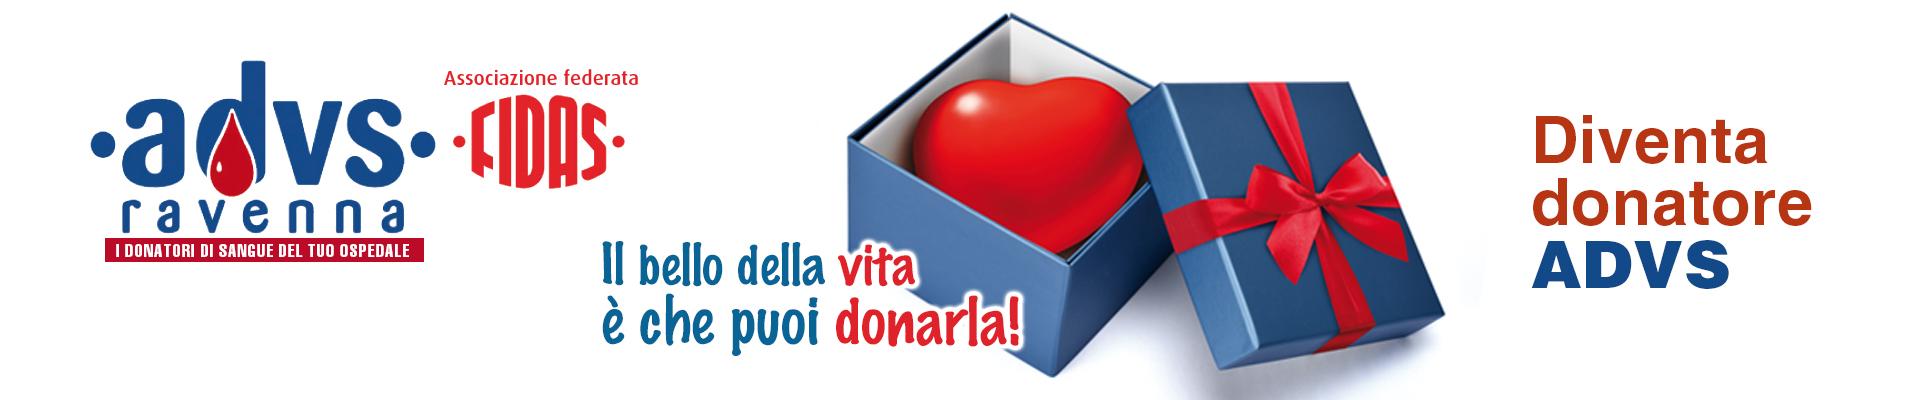 Campagna ADVS Ravenna 2020